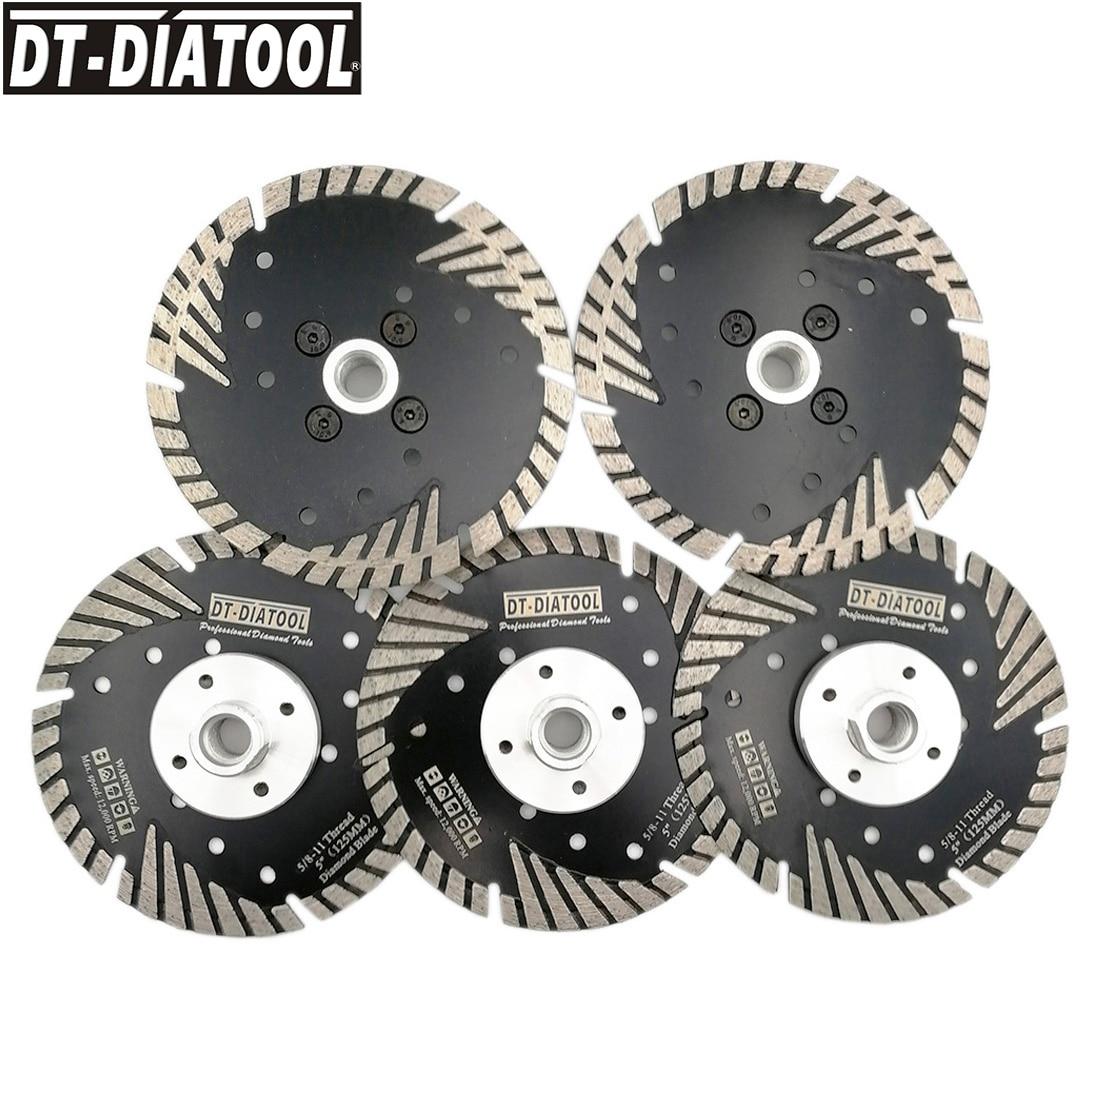 DT-DIATOOL 5pcs 125mm/5inch Professional Quality Hot Pressed Diamond Cutting Discs Turbo Blade For Concrete Brick 5/8-11 Thread